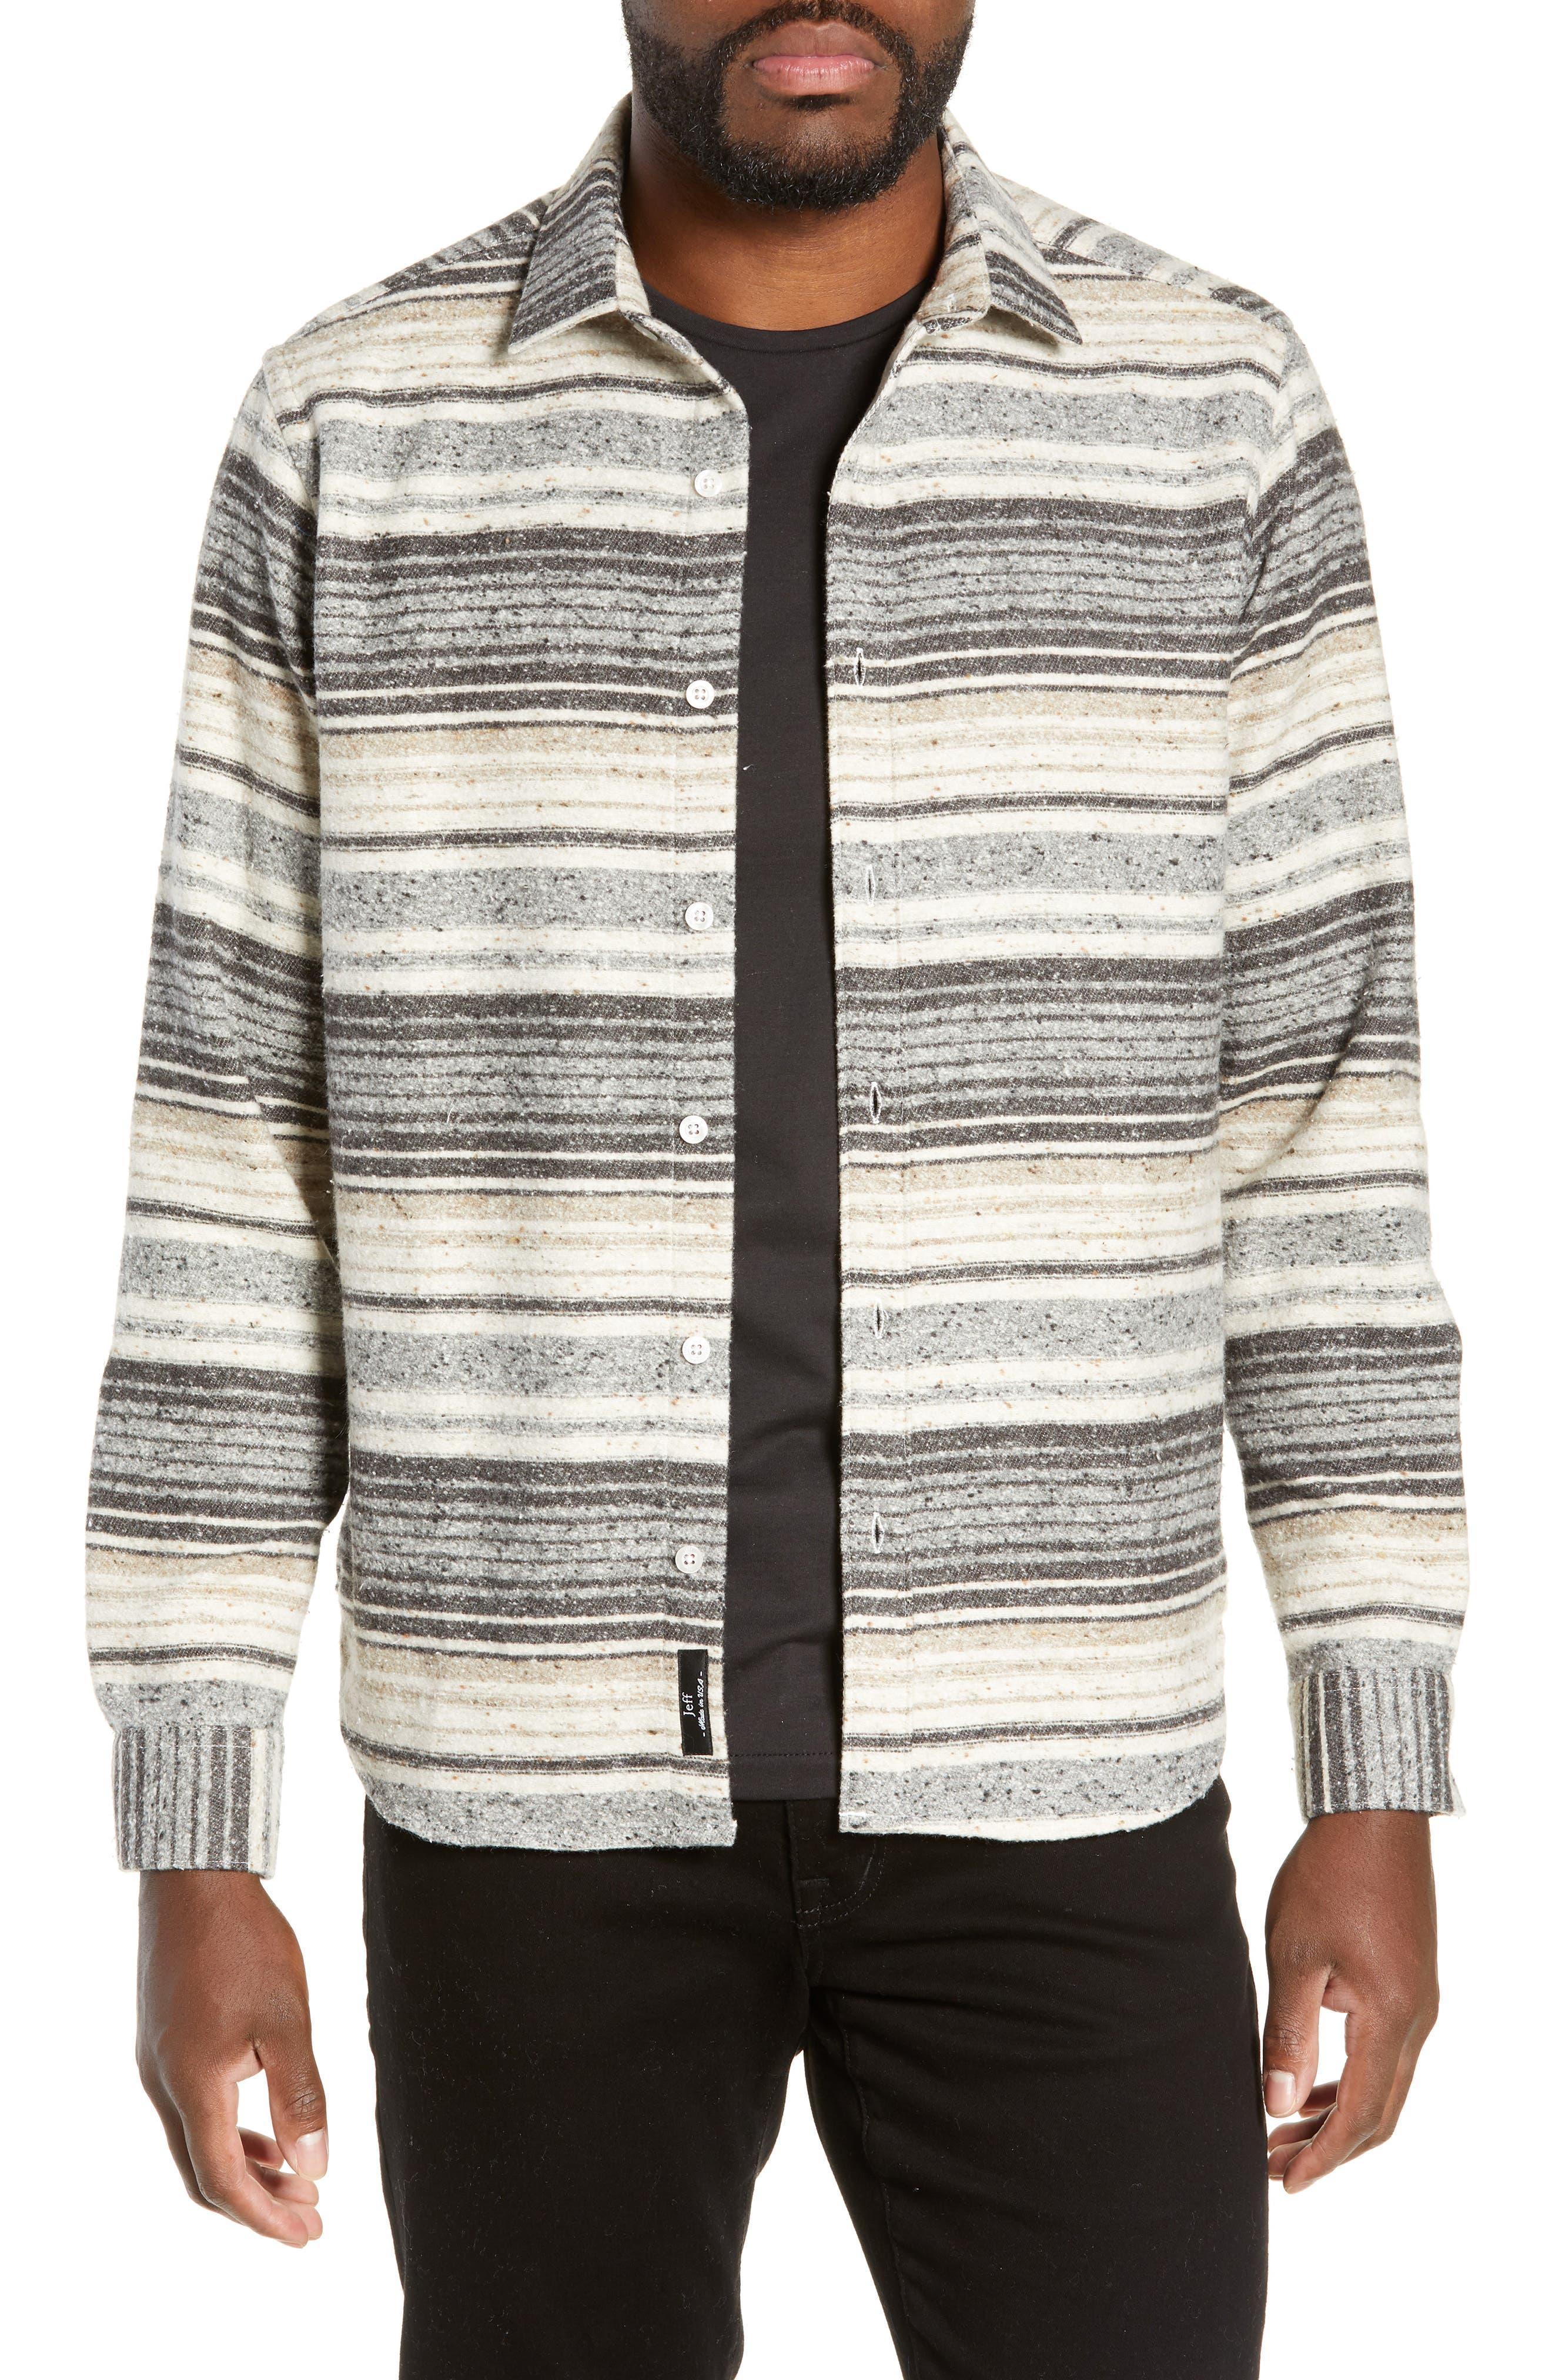 Jeff Benson Slim Fit Marl Stripe Sport Shirt, Grey